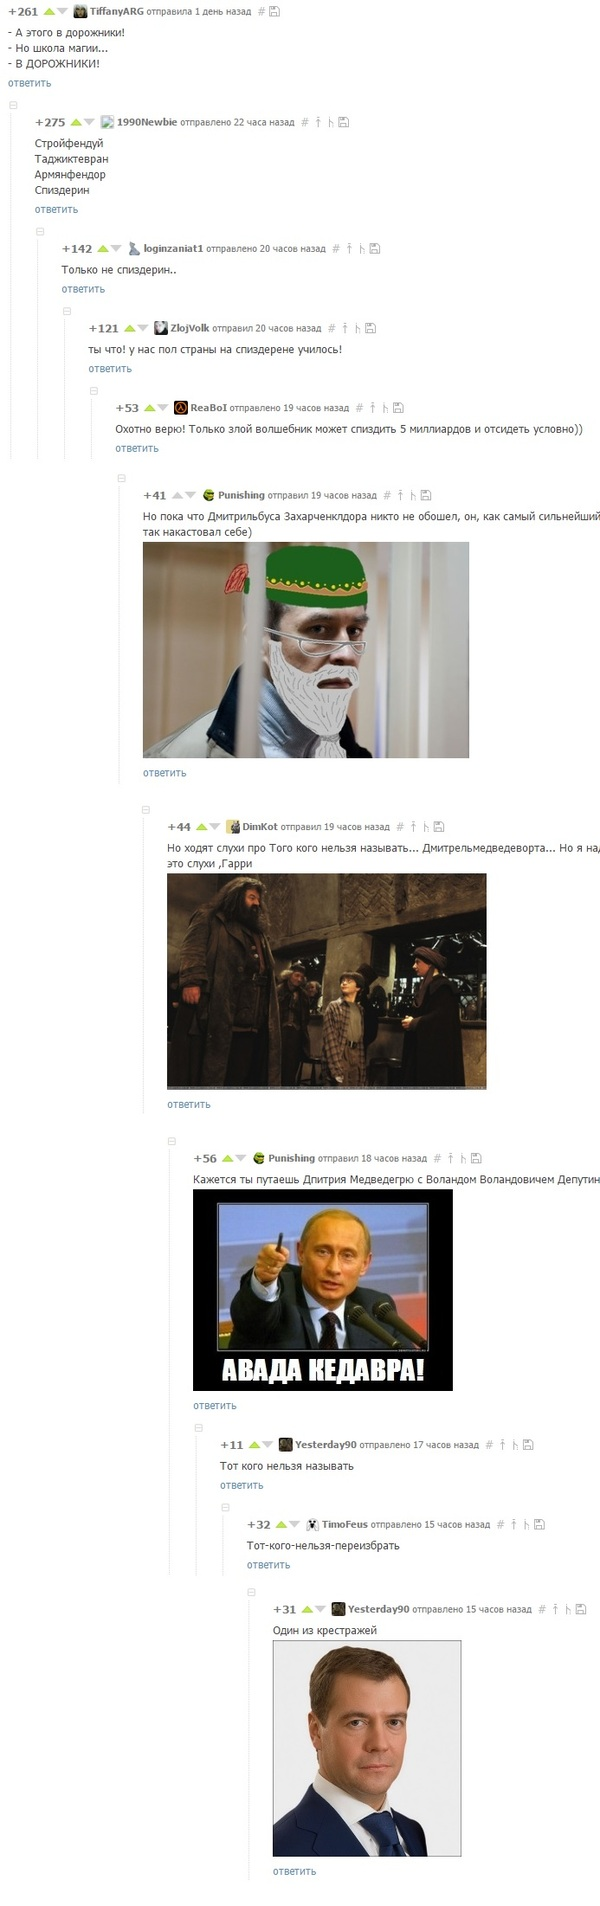 По мотивам Гарри Поттера Скриншот, Гарри Поттер, Факультет, Длиннопост, Политика